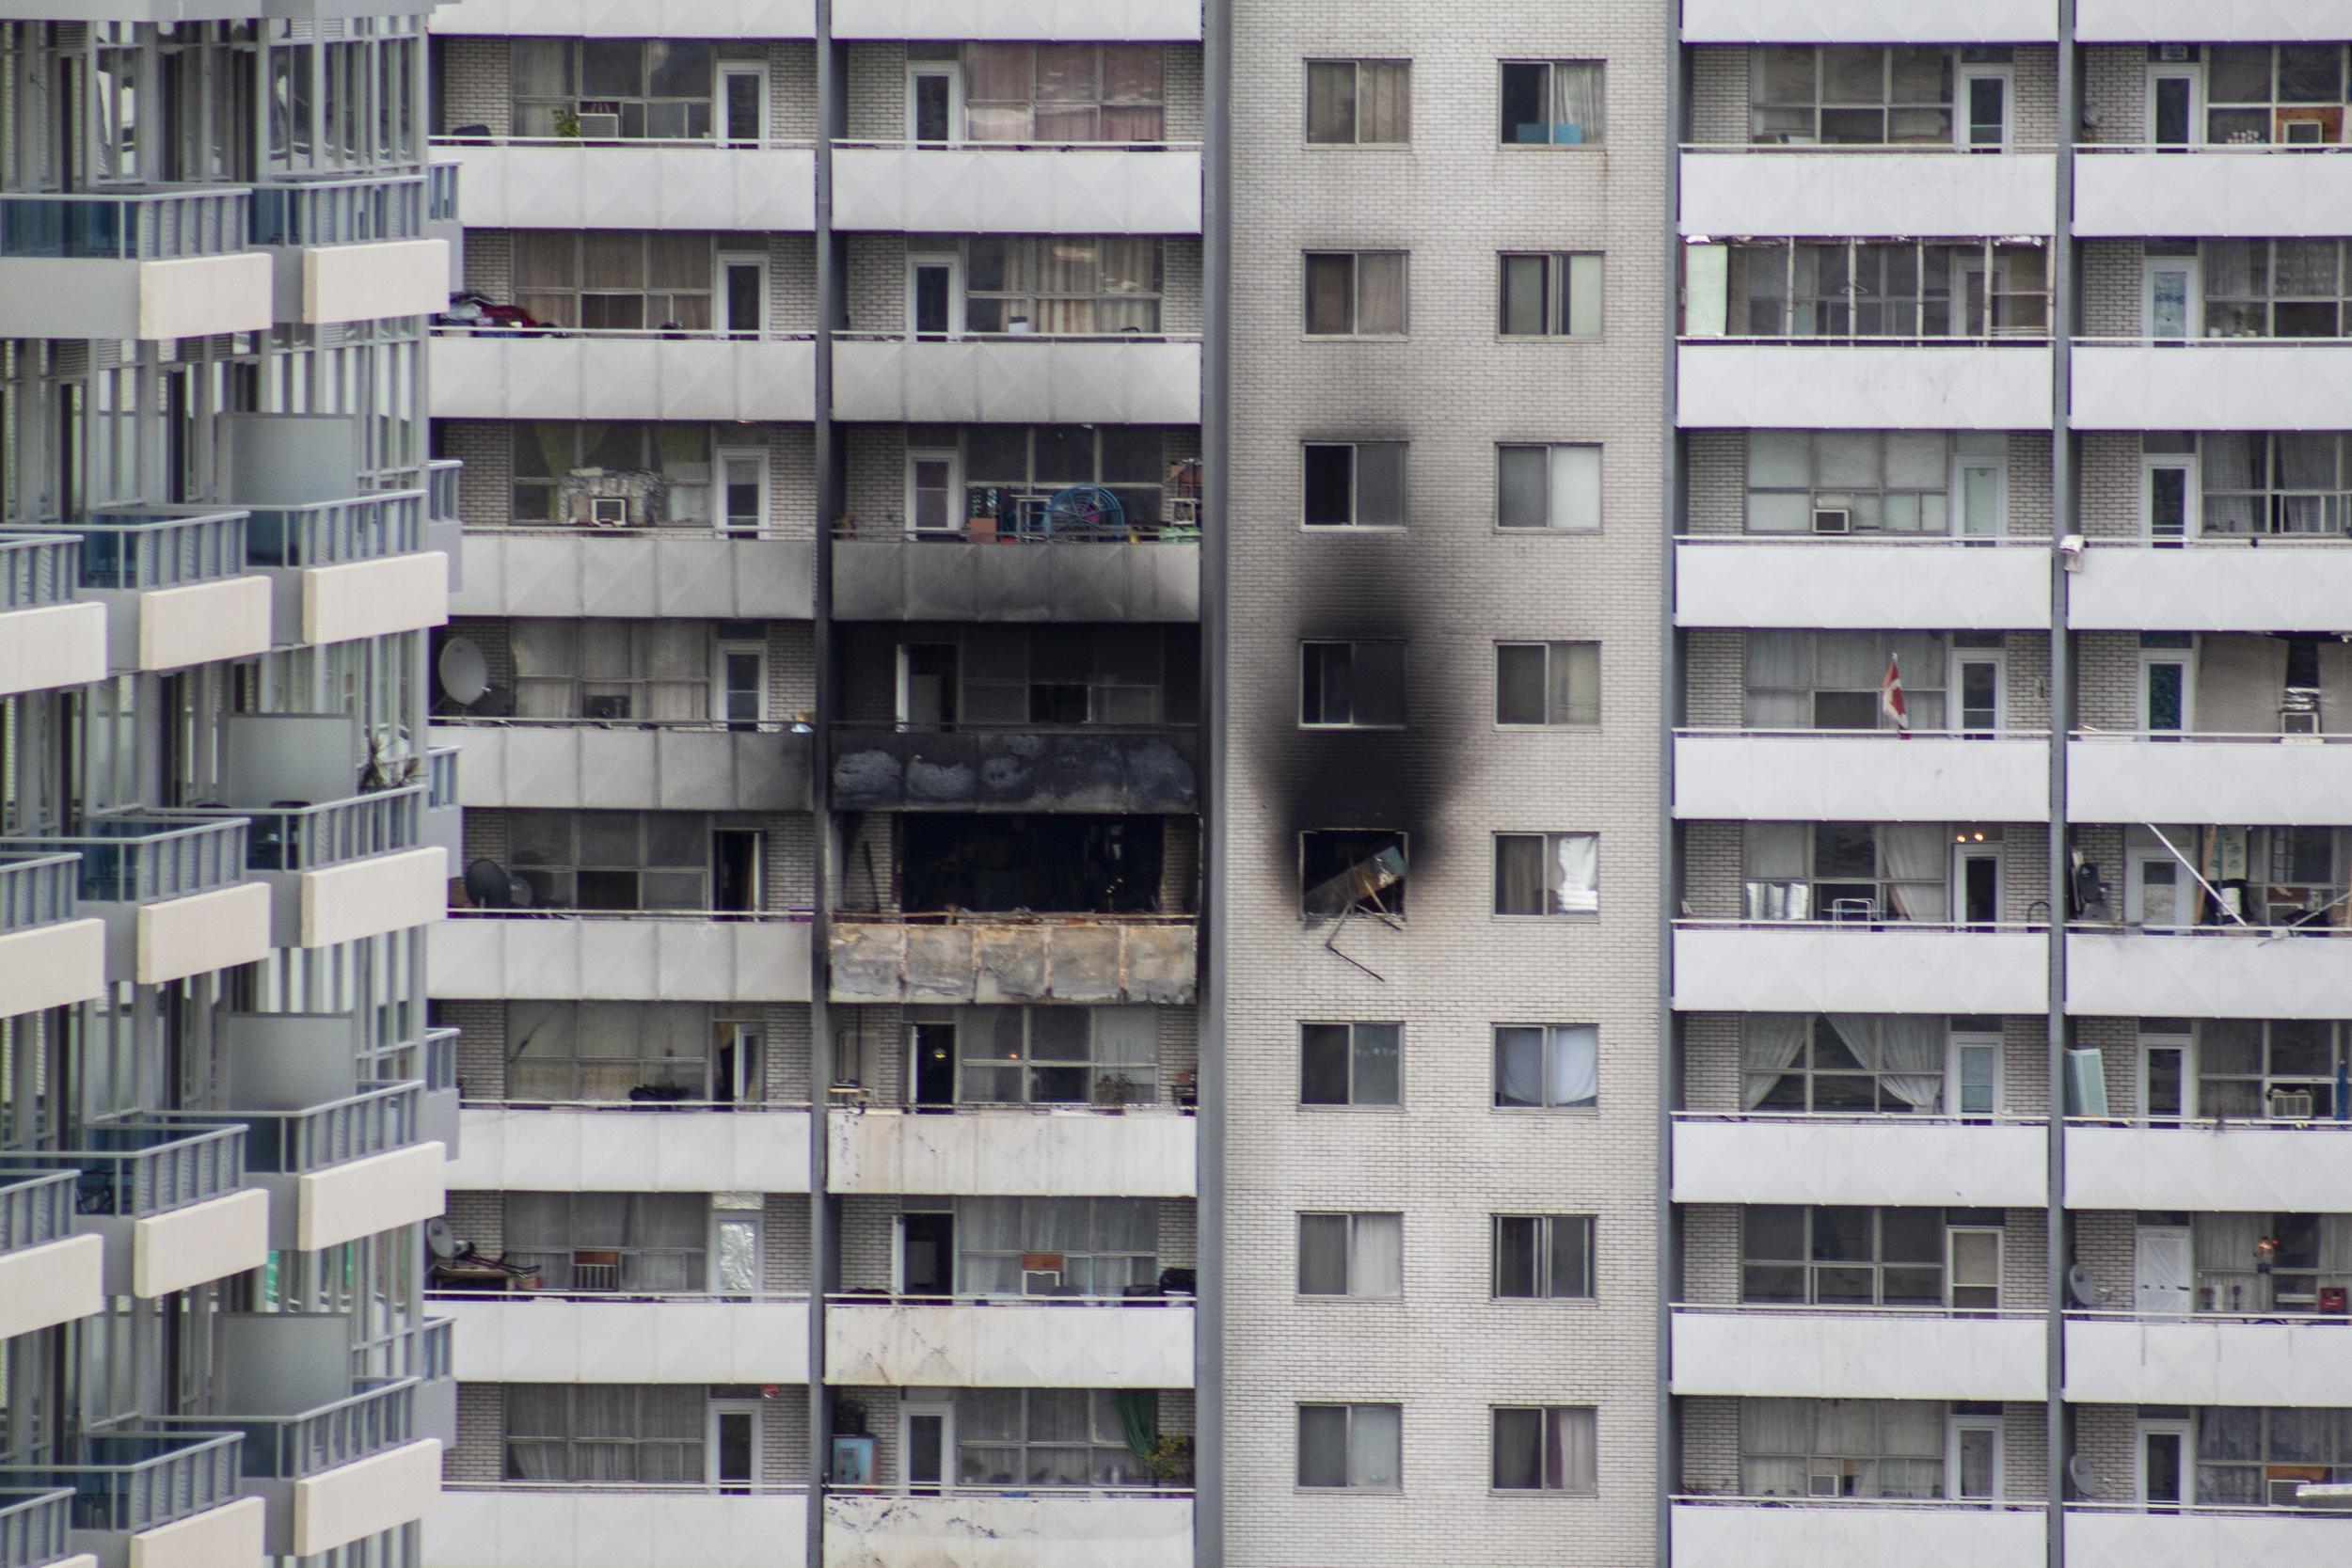 Fire damage at 200 Wellesley St. E. in Toronto pictured on Sept. 25, 2010. (Steve Silva)